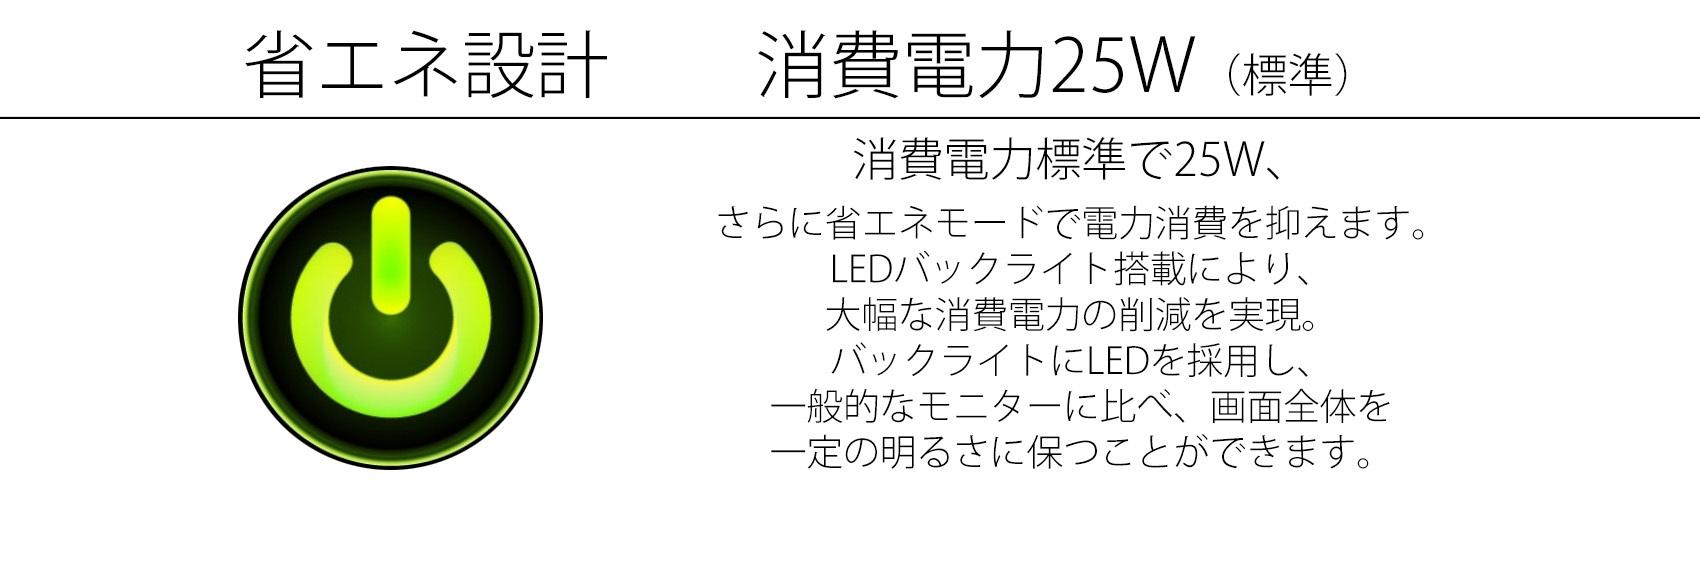 JN-T2880UHD 仕様表